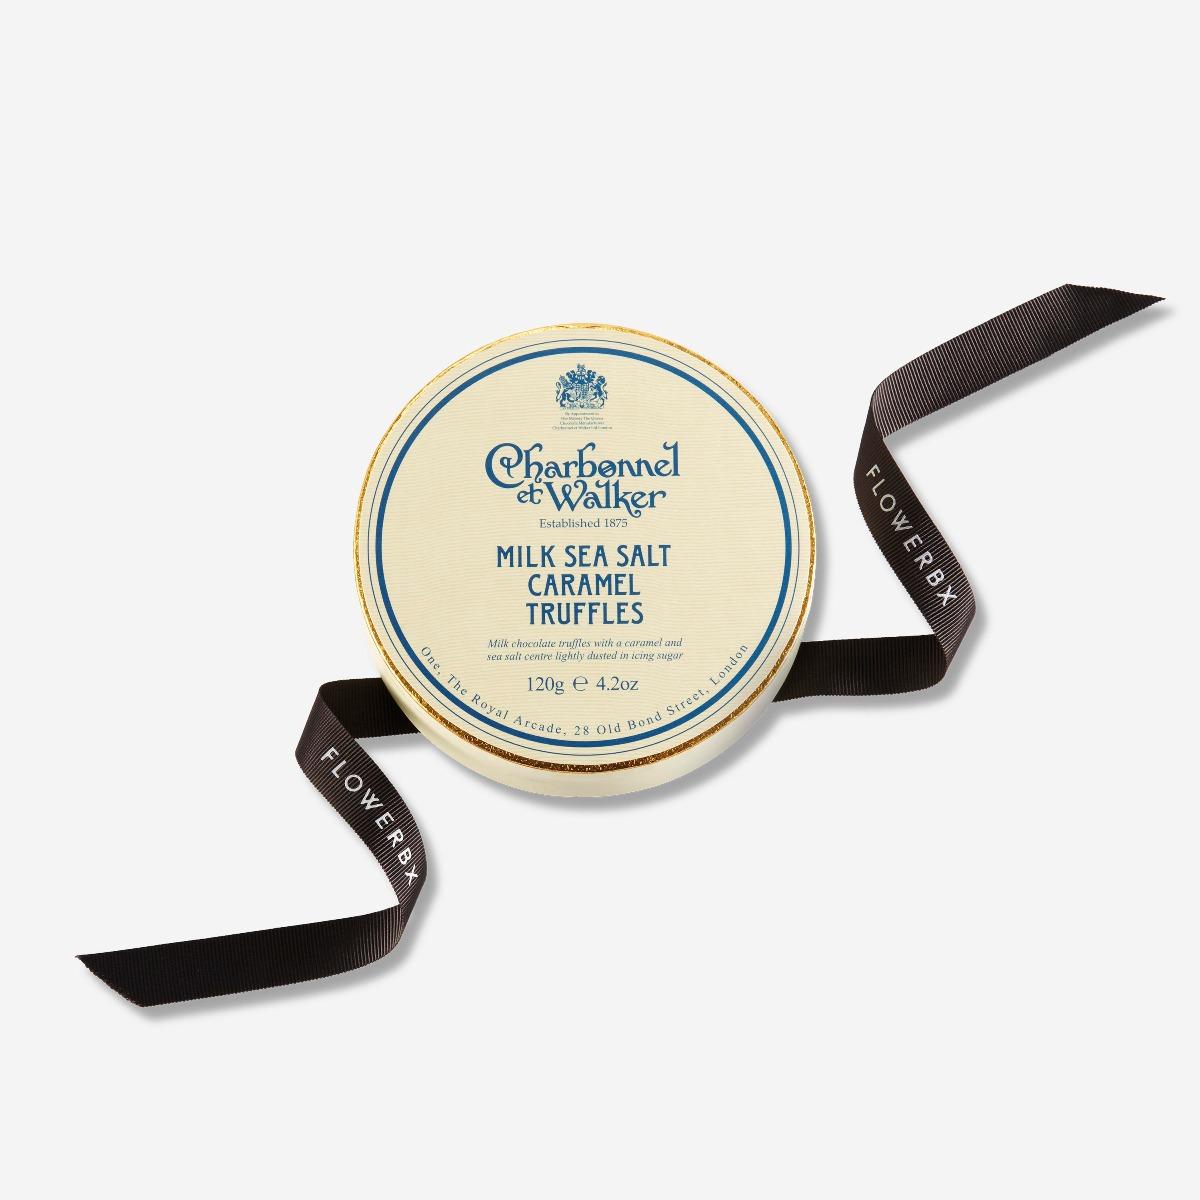 Charbonnel et Walker Milk Sea Salt Caramel Chocolate Truffle